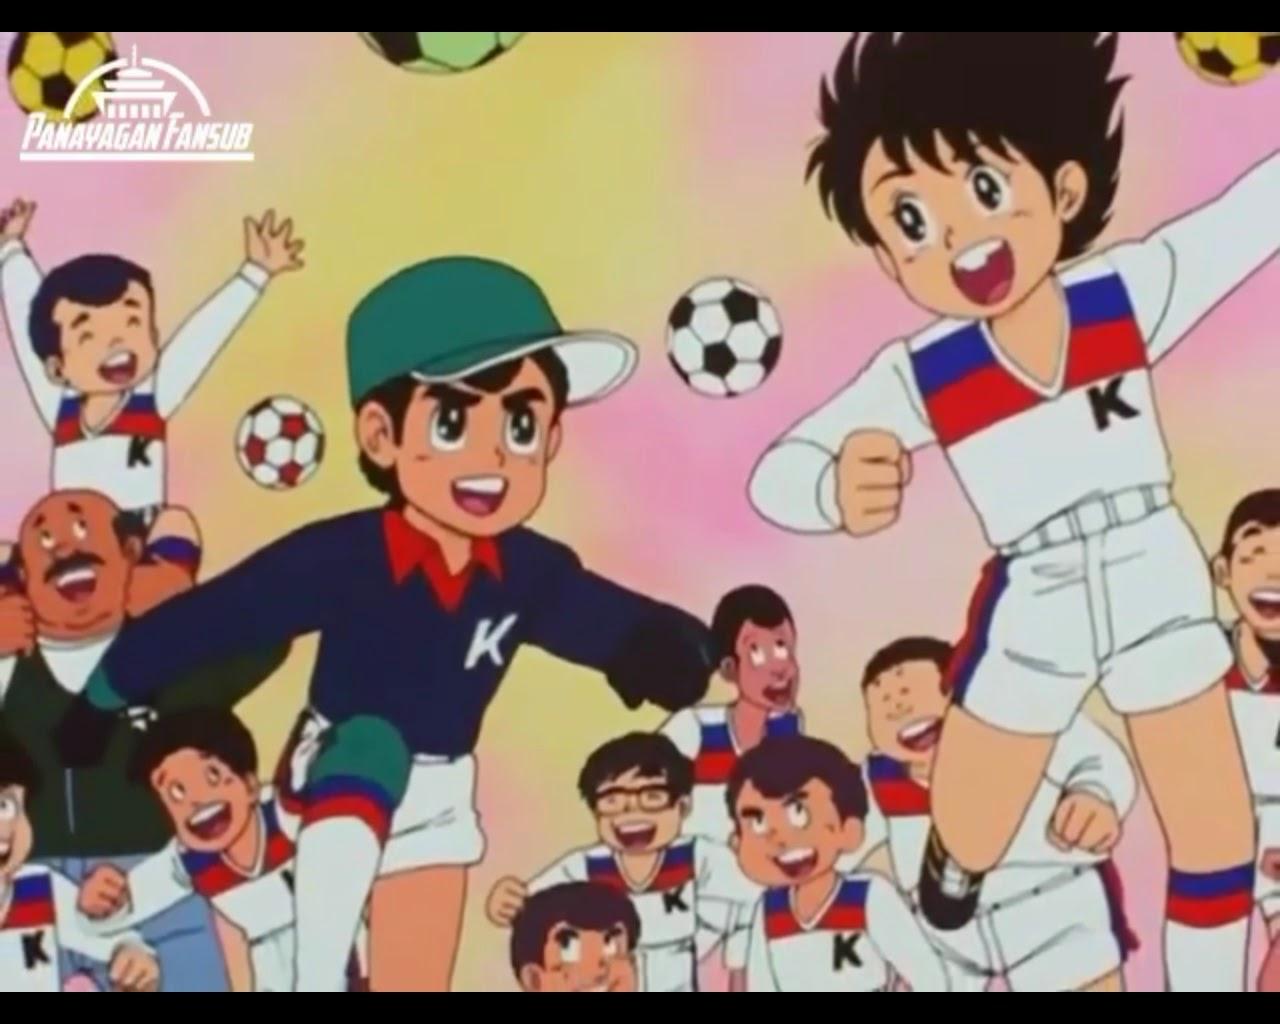 Download Ganbare! Kickers Episode 03 Subtitle Indonesia